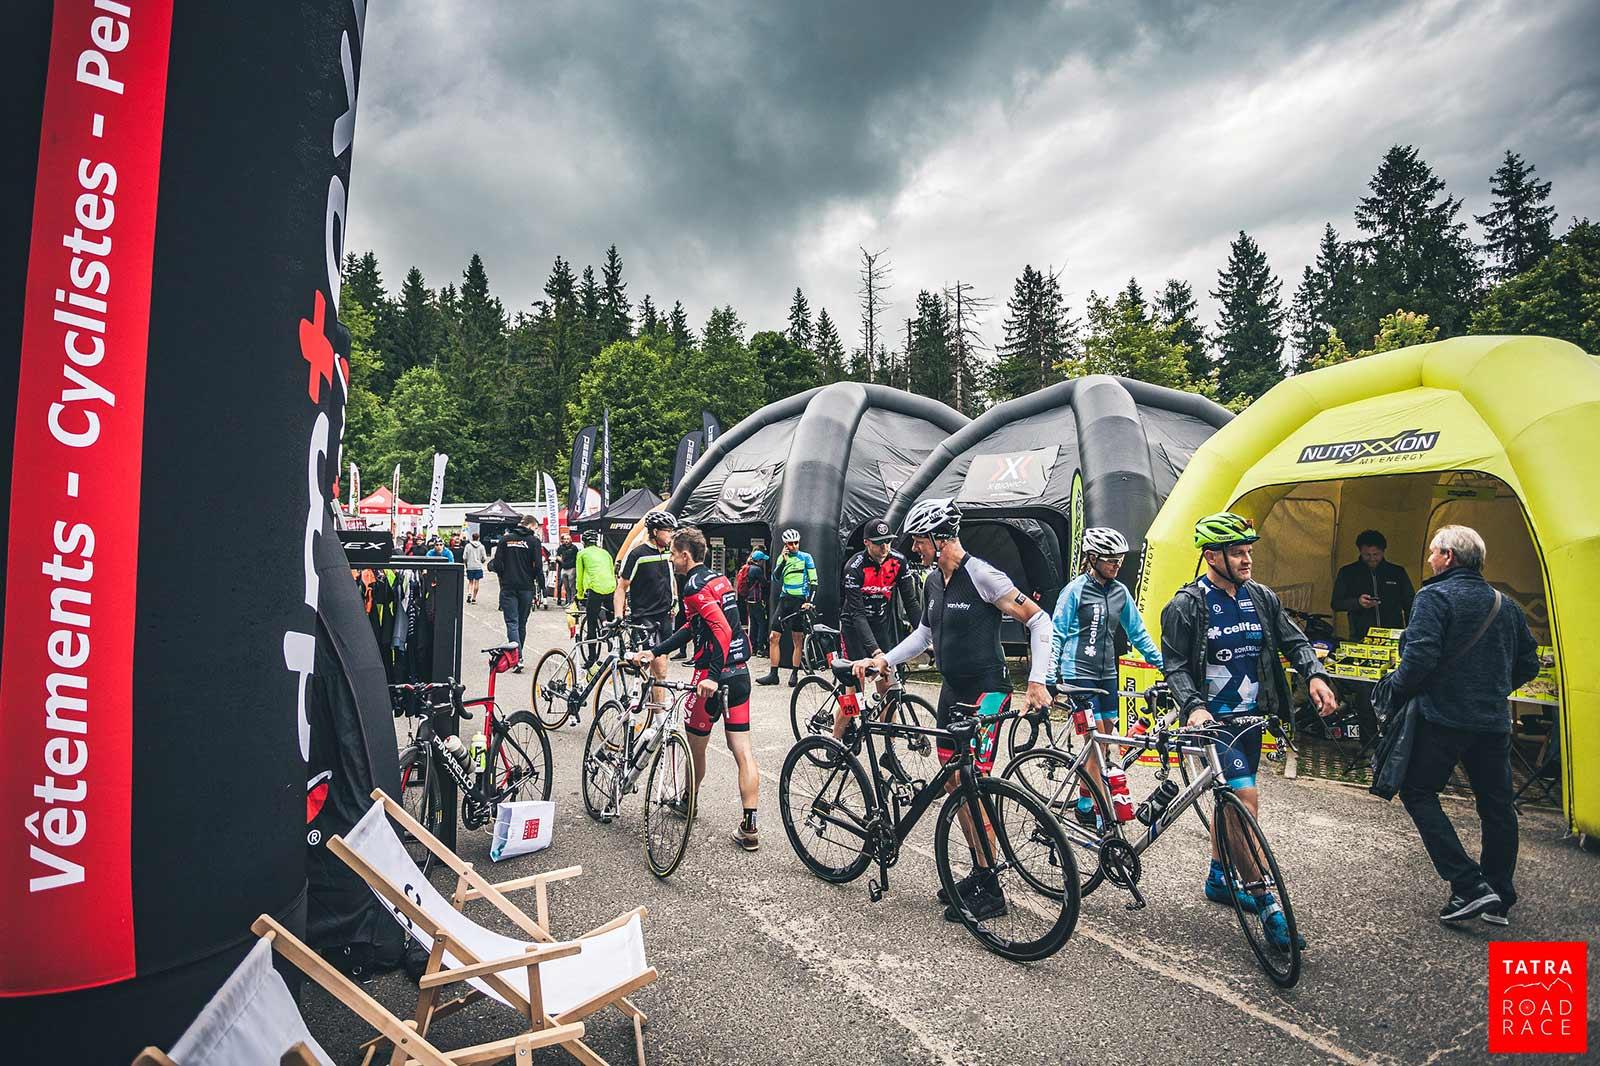 Tatra-Road-Race-2